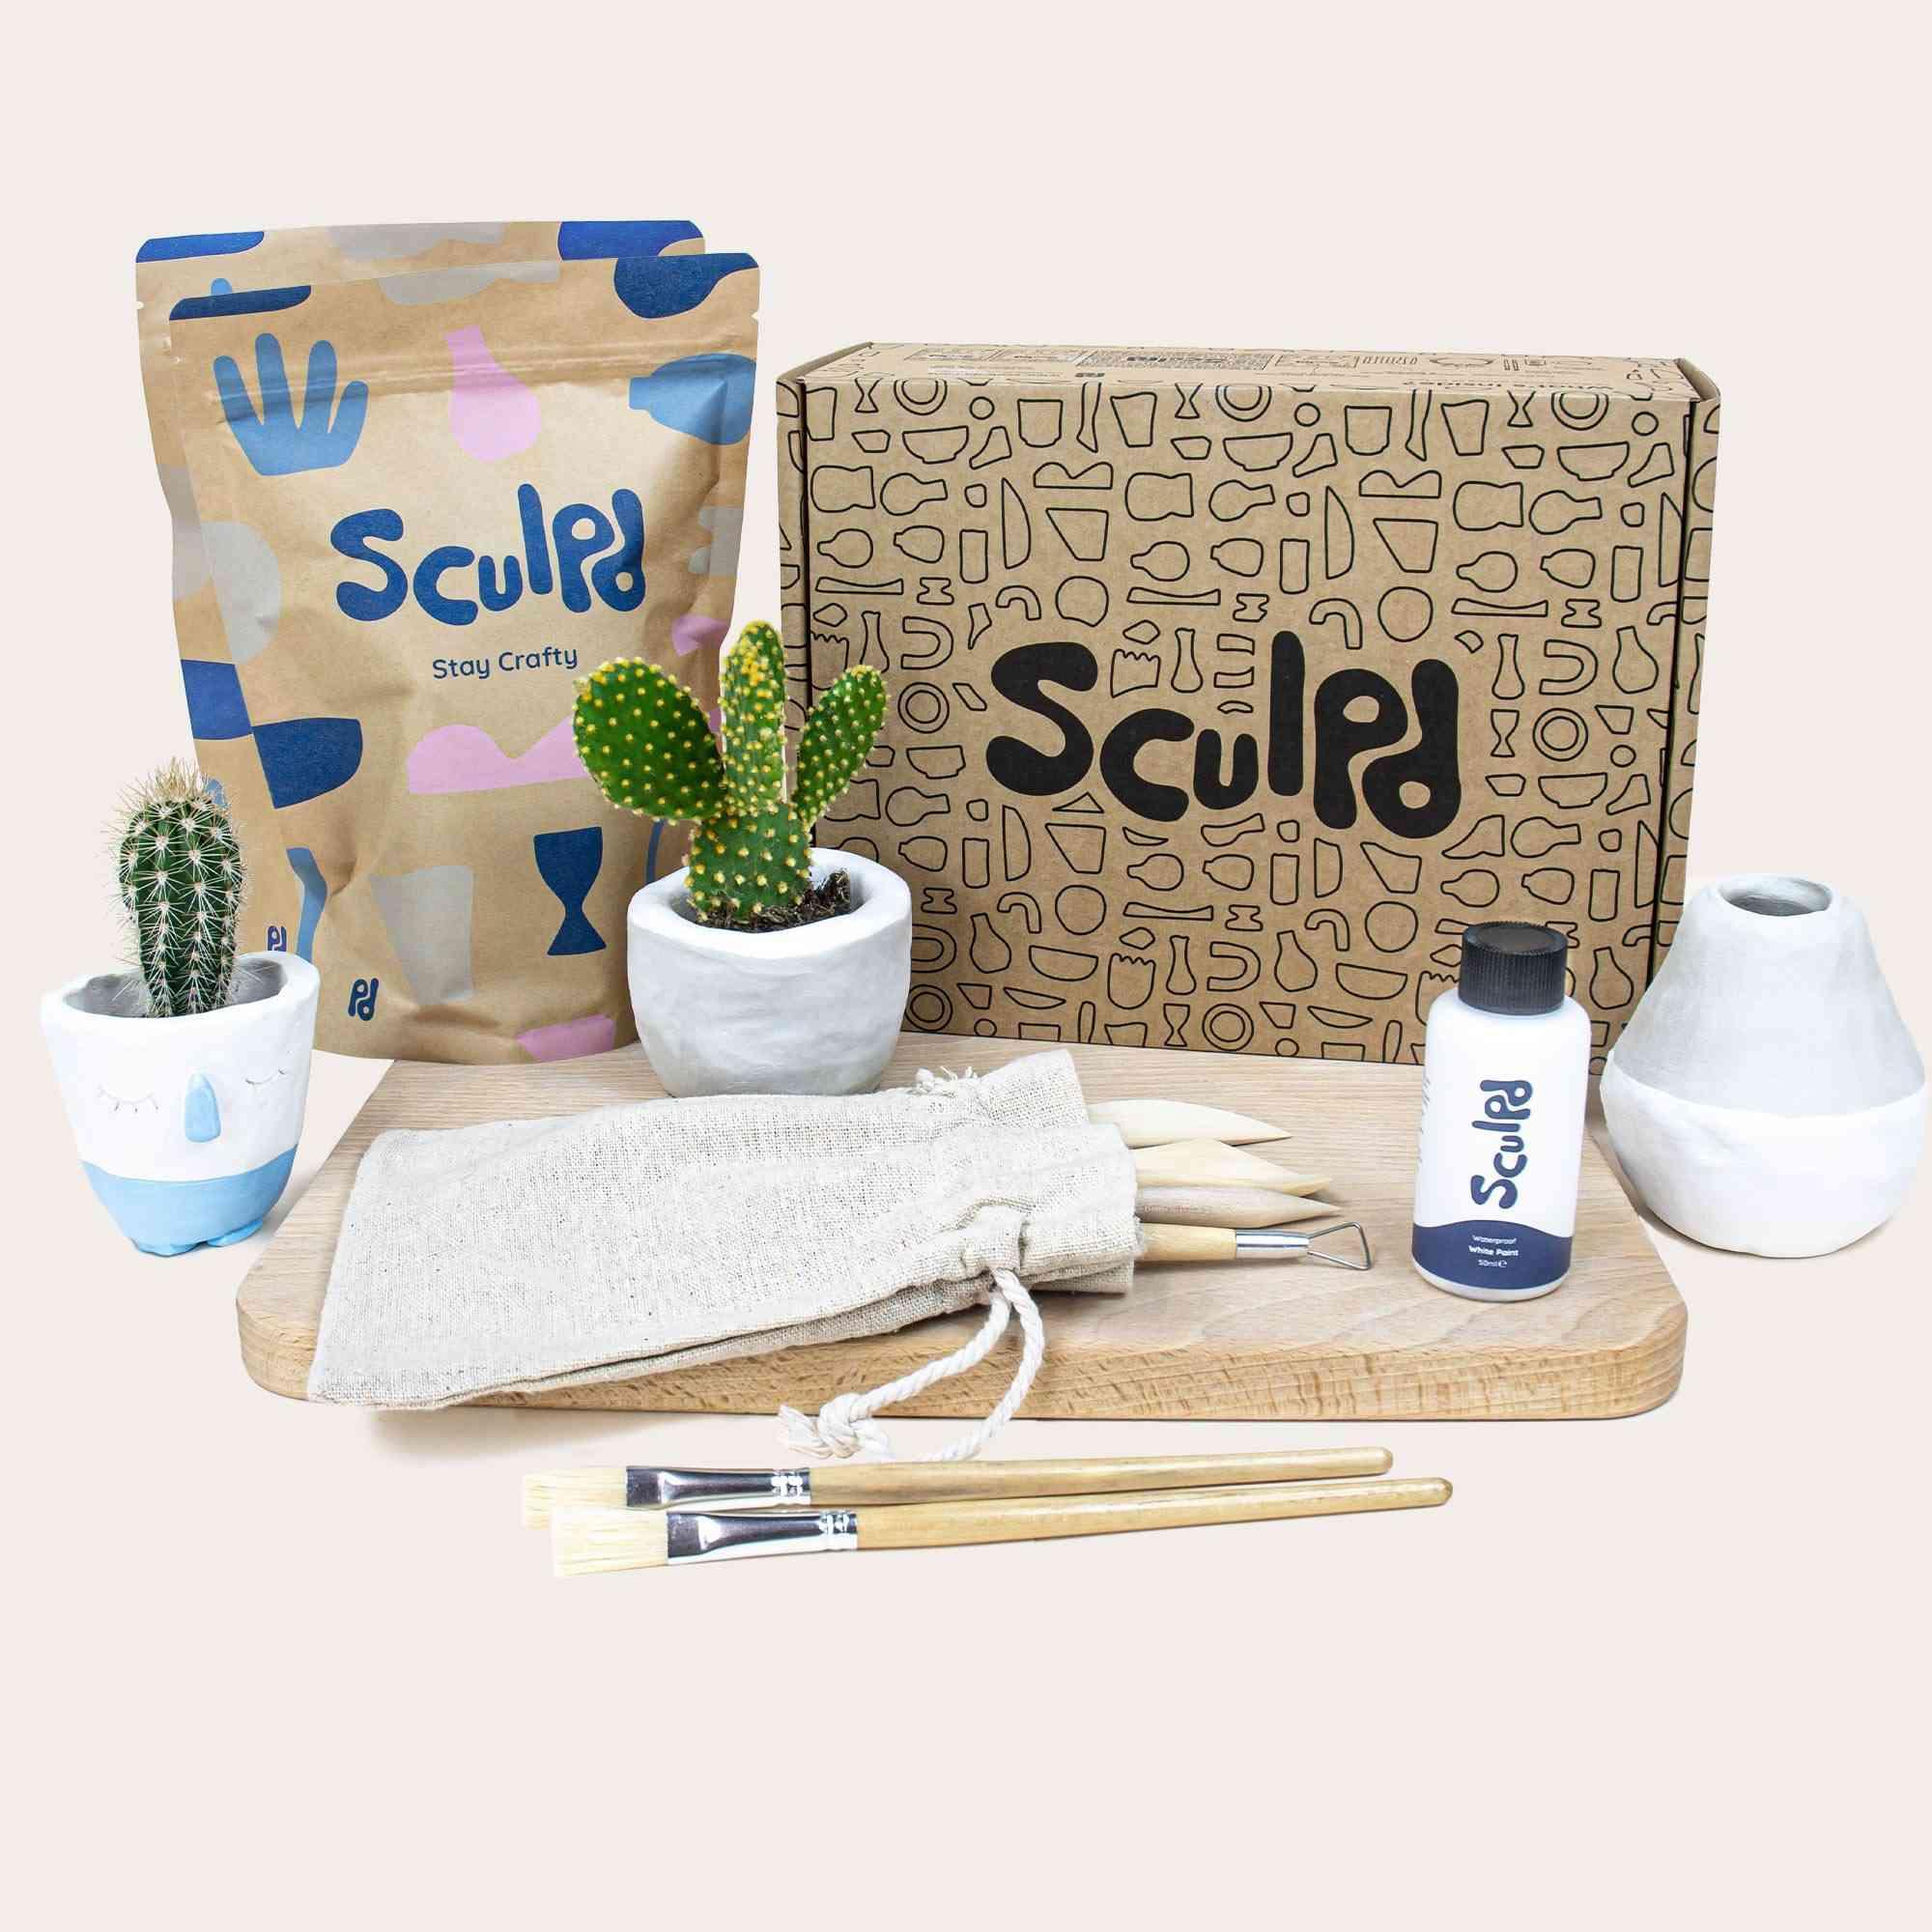 Sculpd Pottery Kit